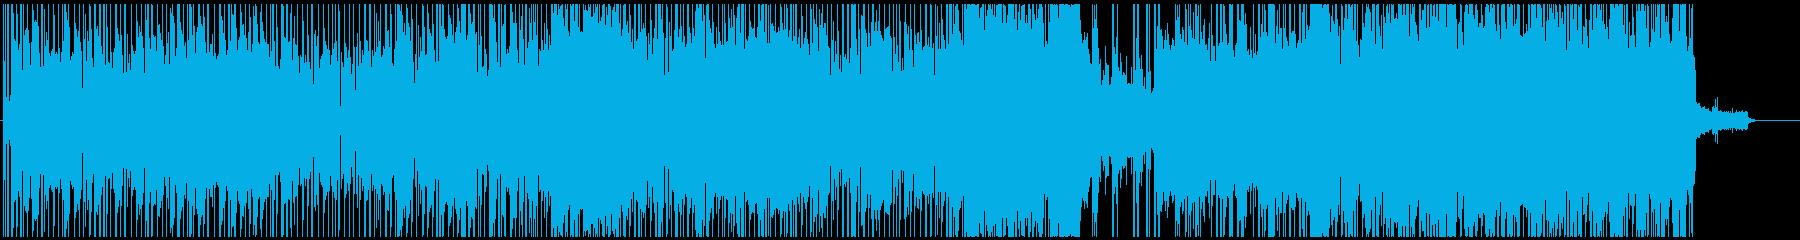 VIDEOの再生済みの波形